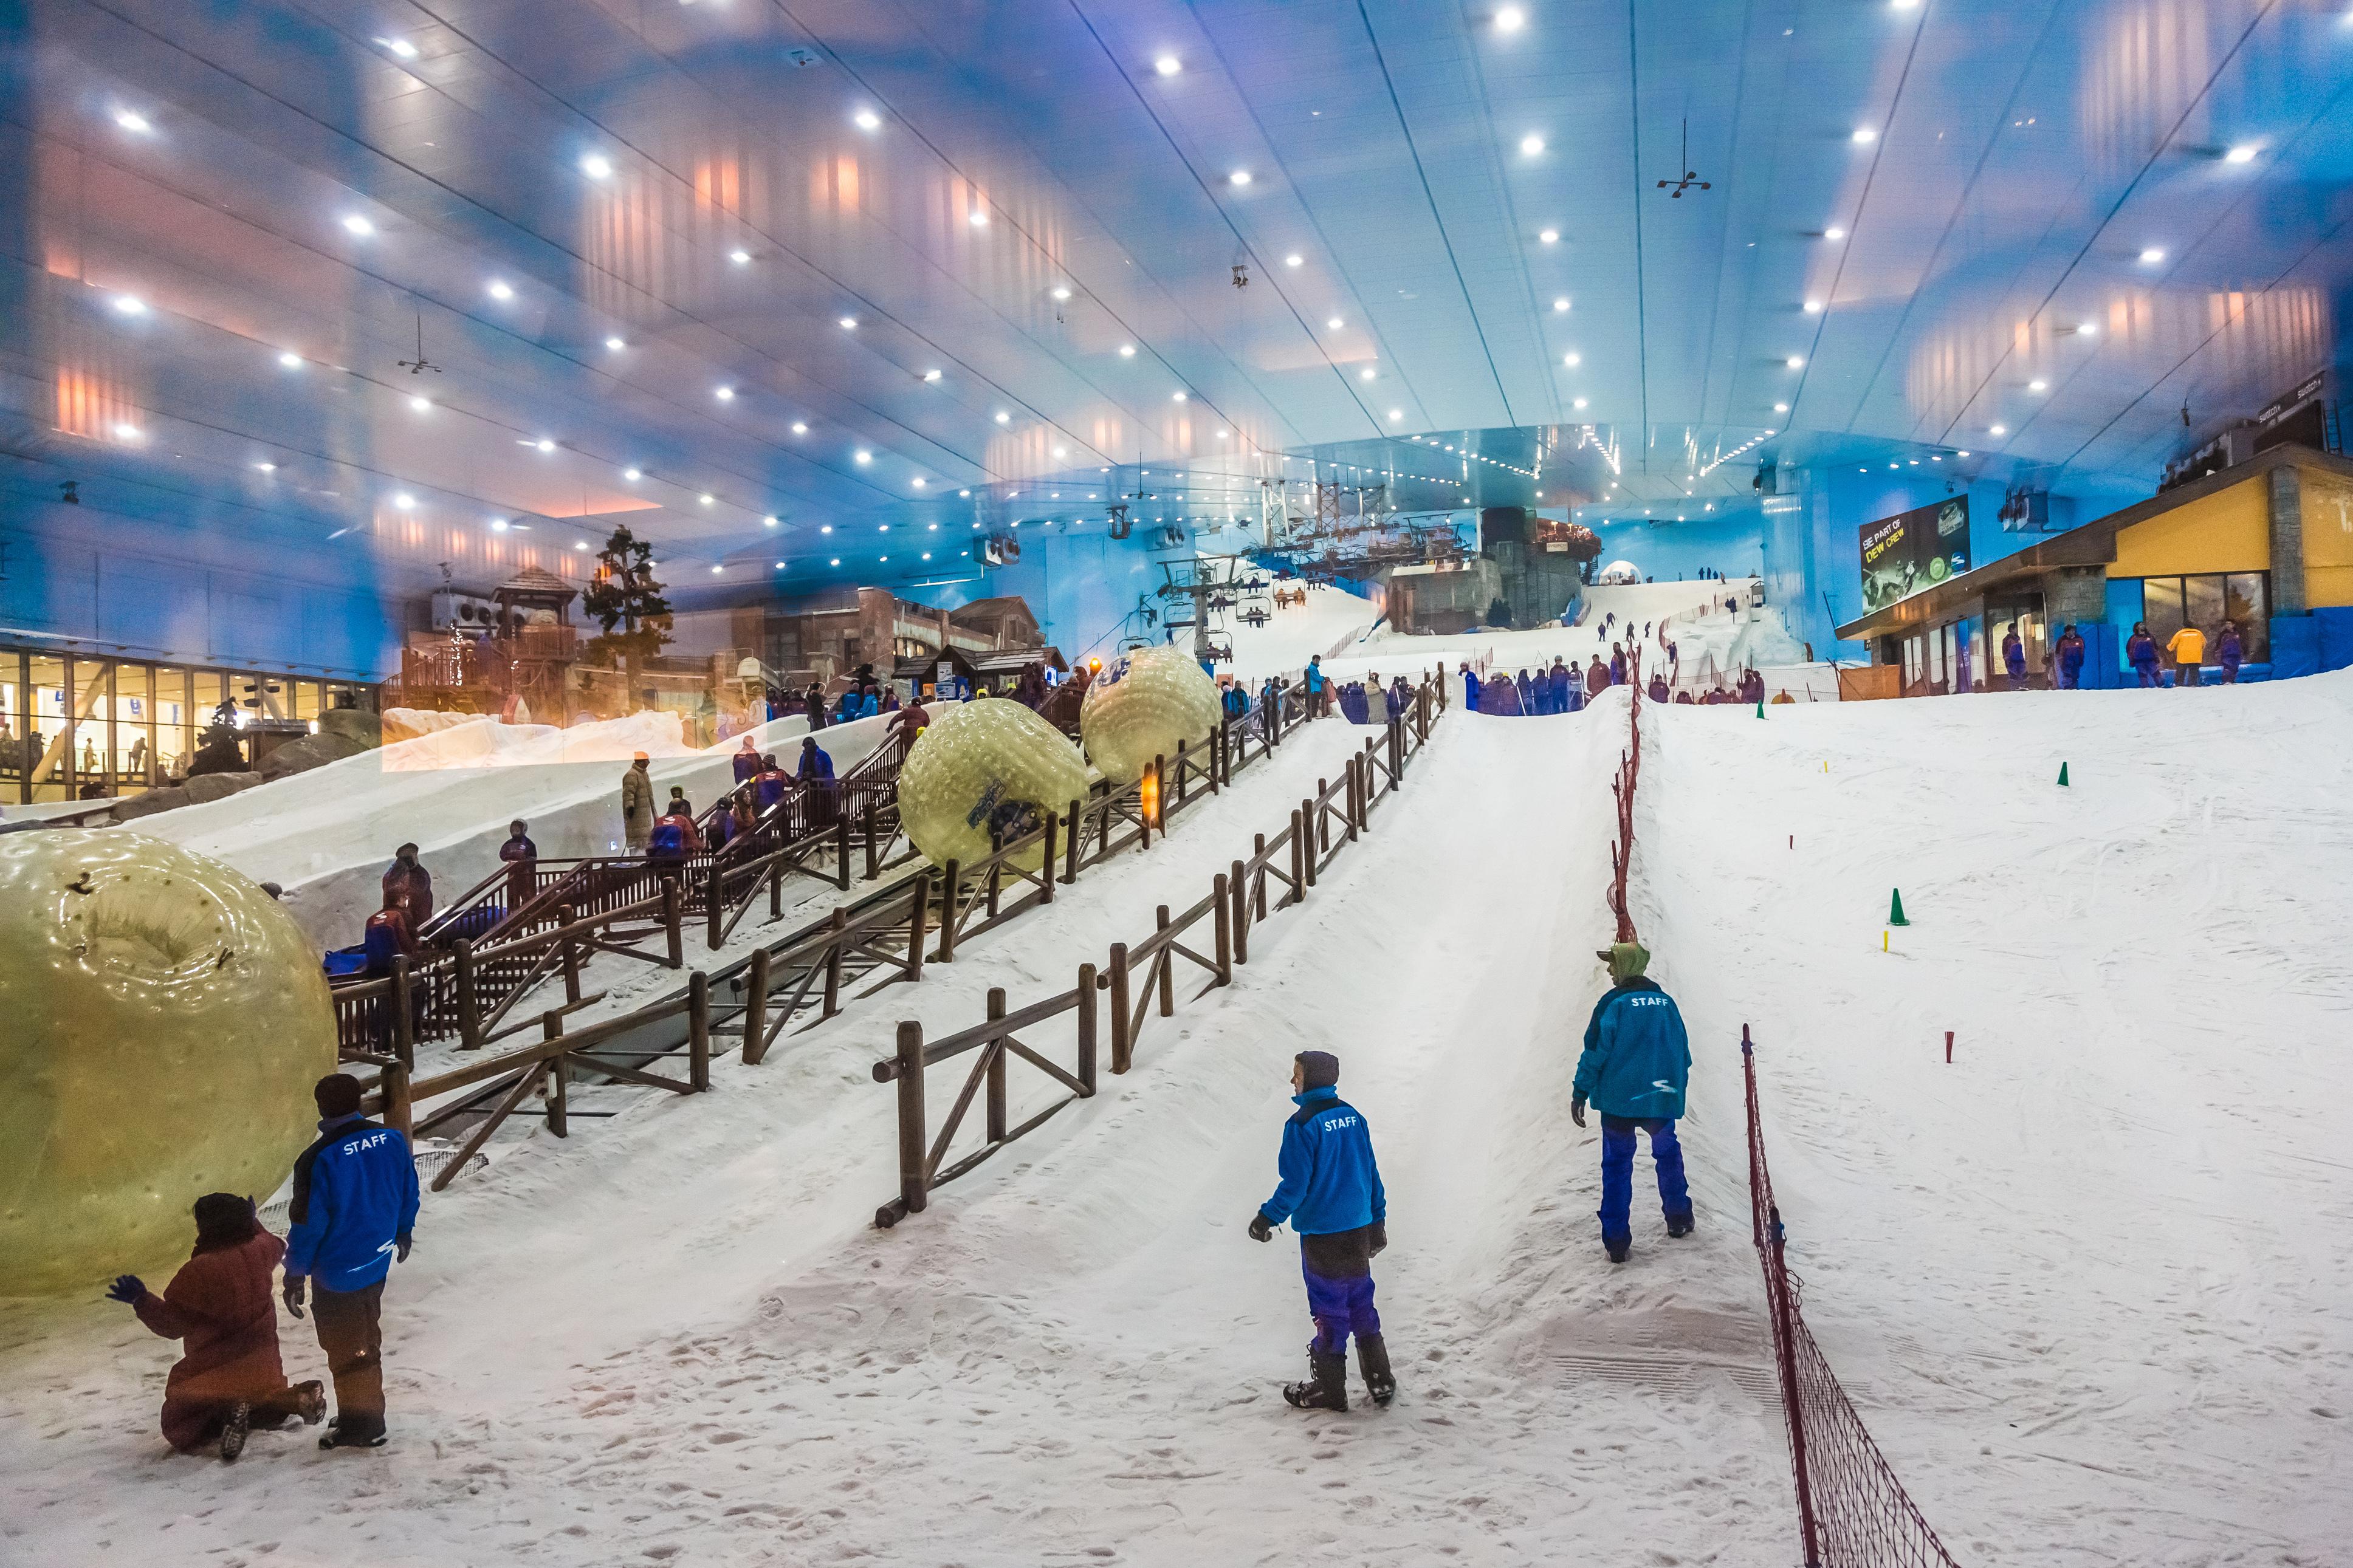 Upgrade Your Next Holiday to Dubai with a Trip to Ski Dubai